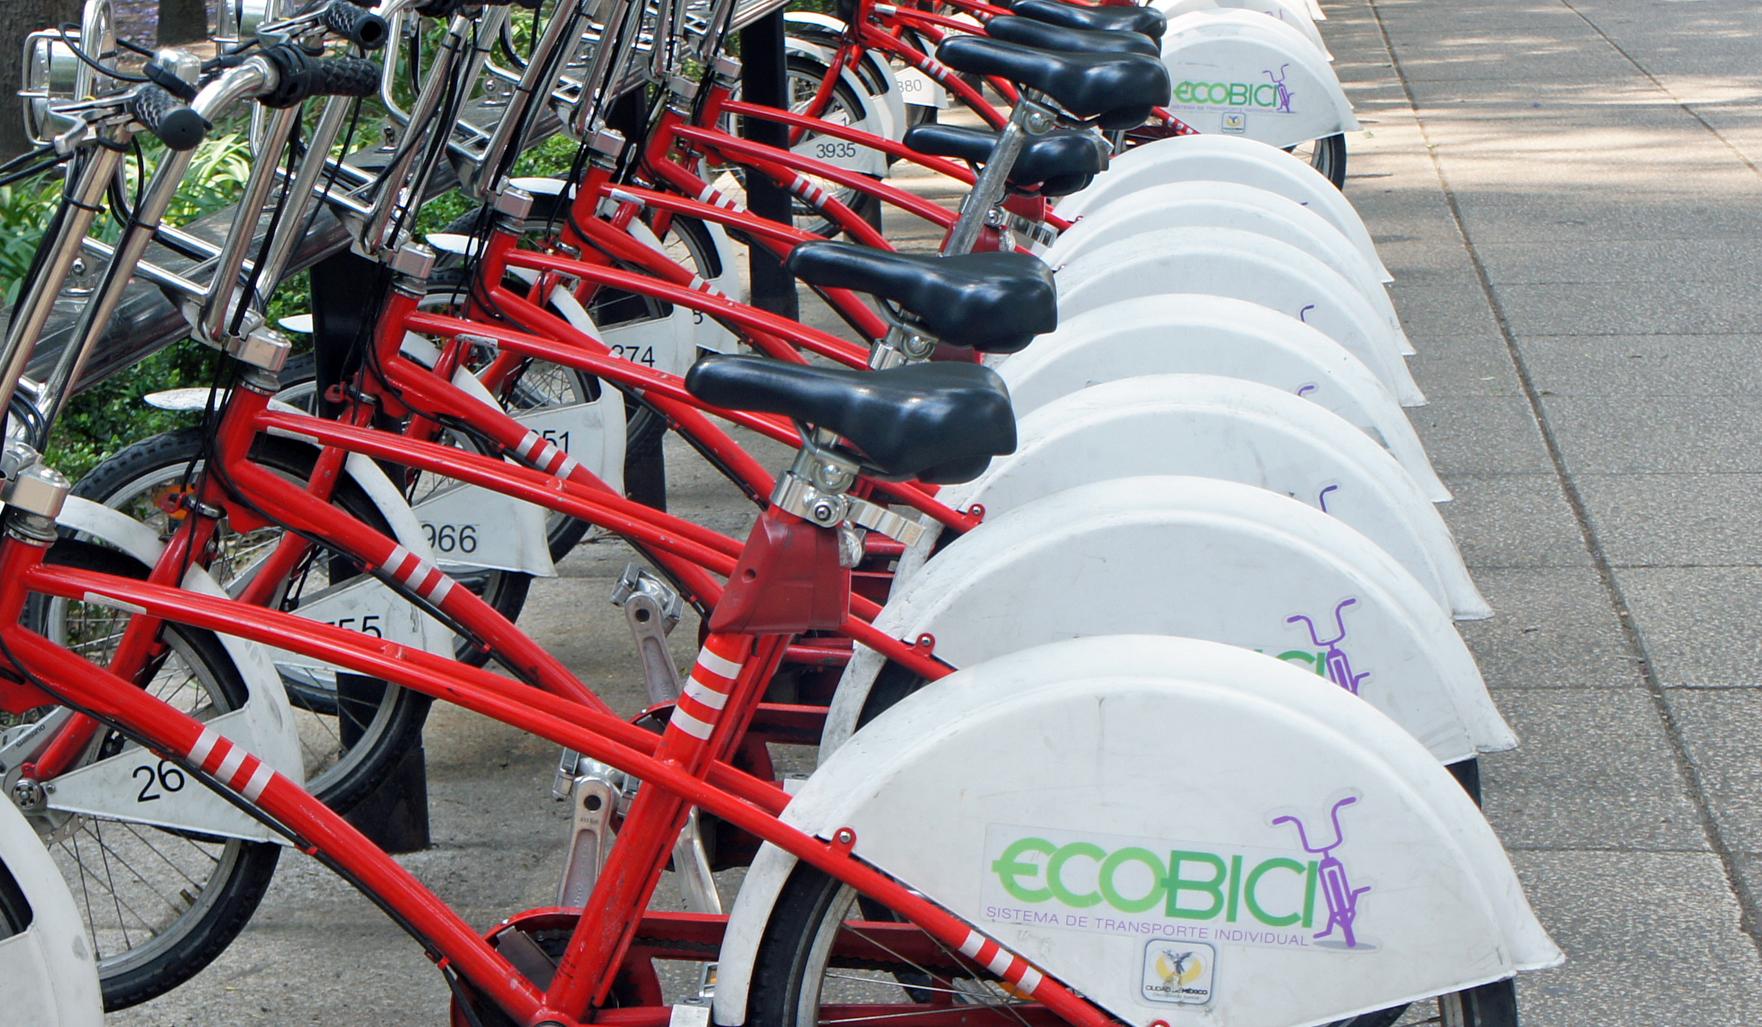 Ecobici Mexico City